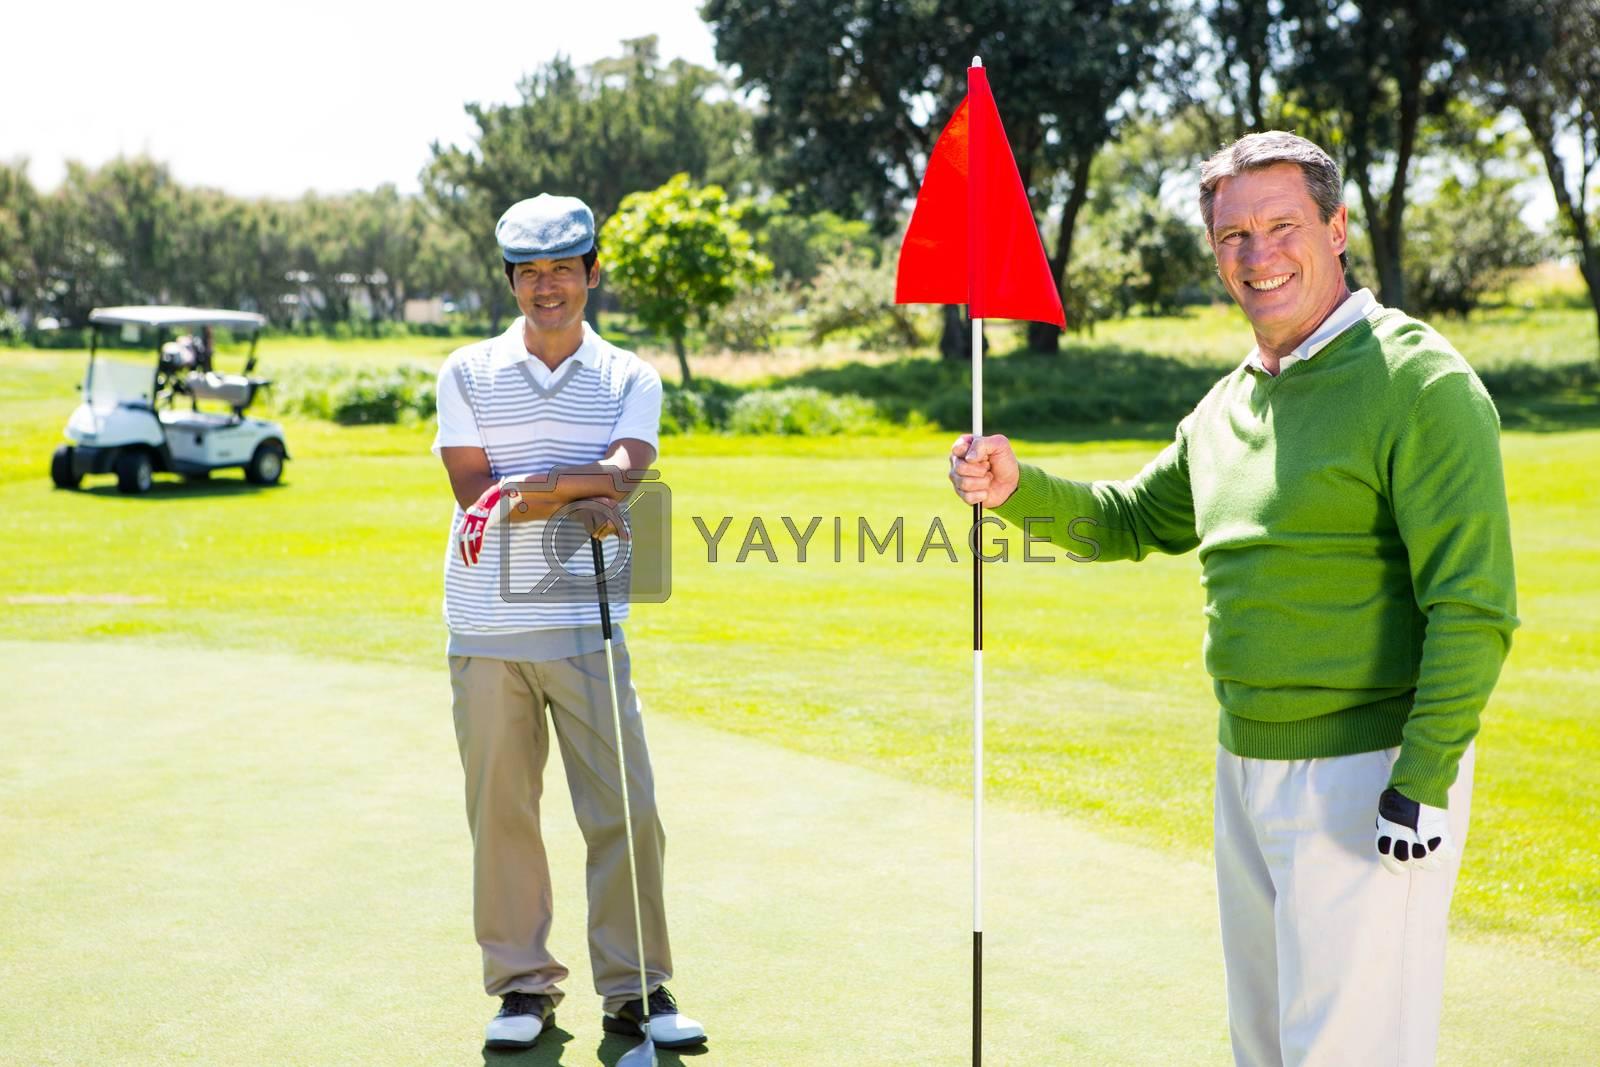 Golfing friends smiling at camera  by Wavebreakmedia